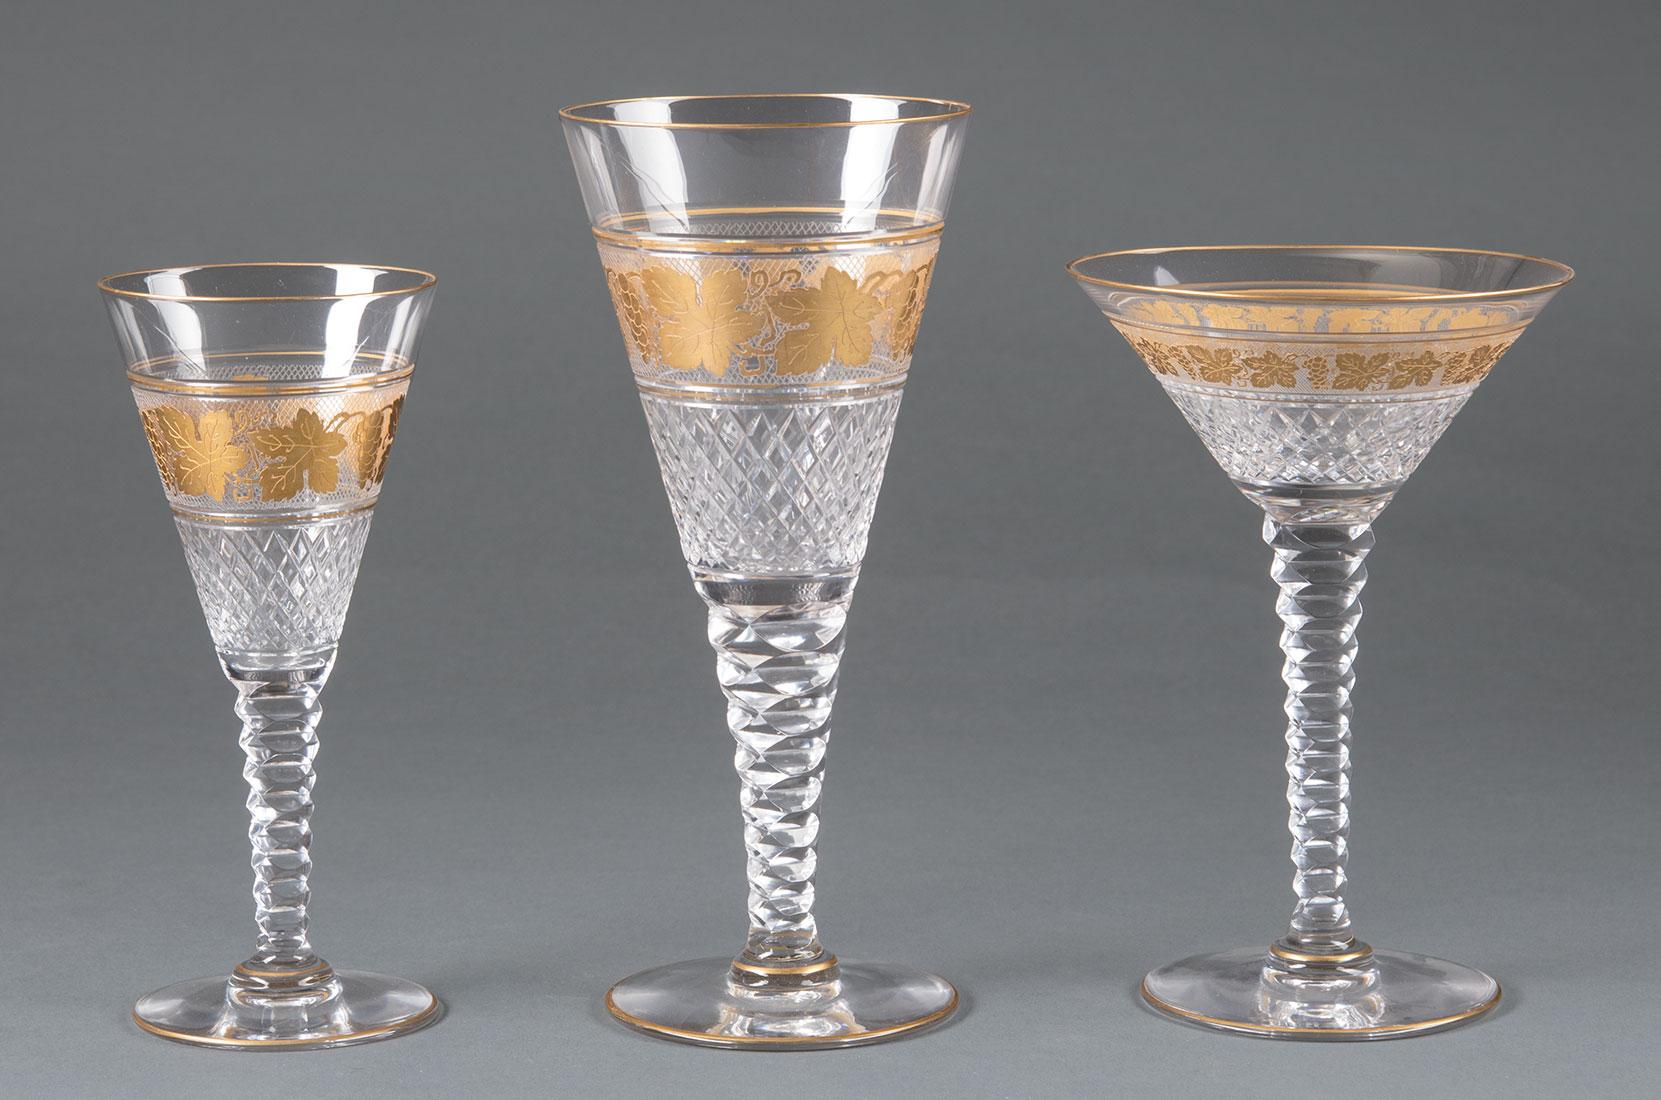 Lot 986 - French St. Louis-Style Gilt Cut-Glass Stemware